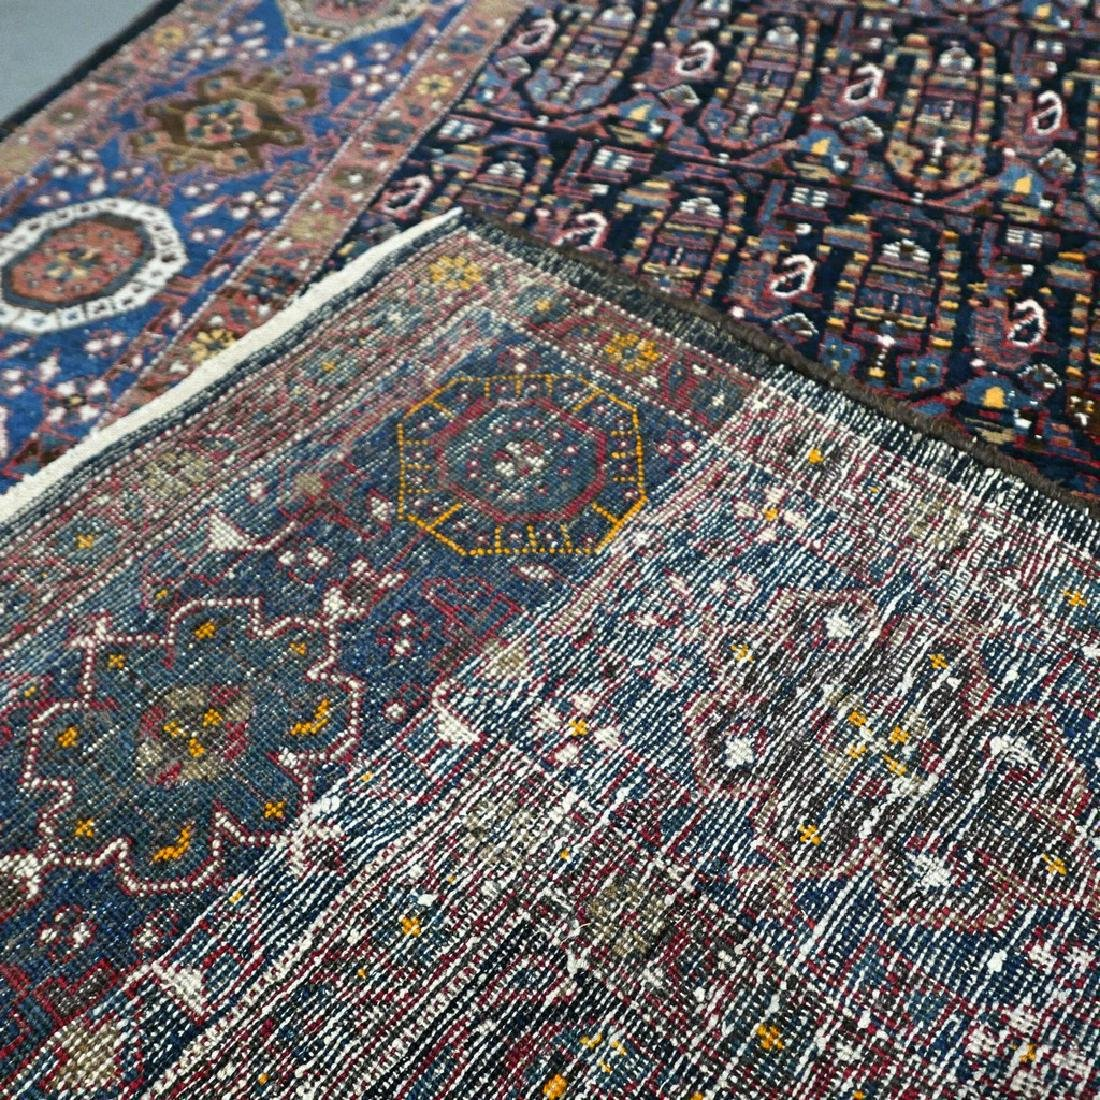 10.1x4.3 Antique Armenian boteh Kazak rug - 1880s - - 10